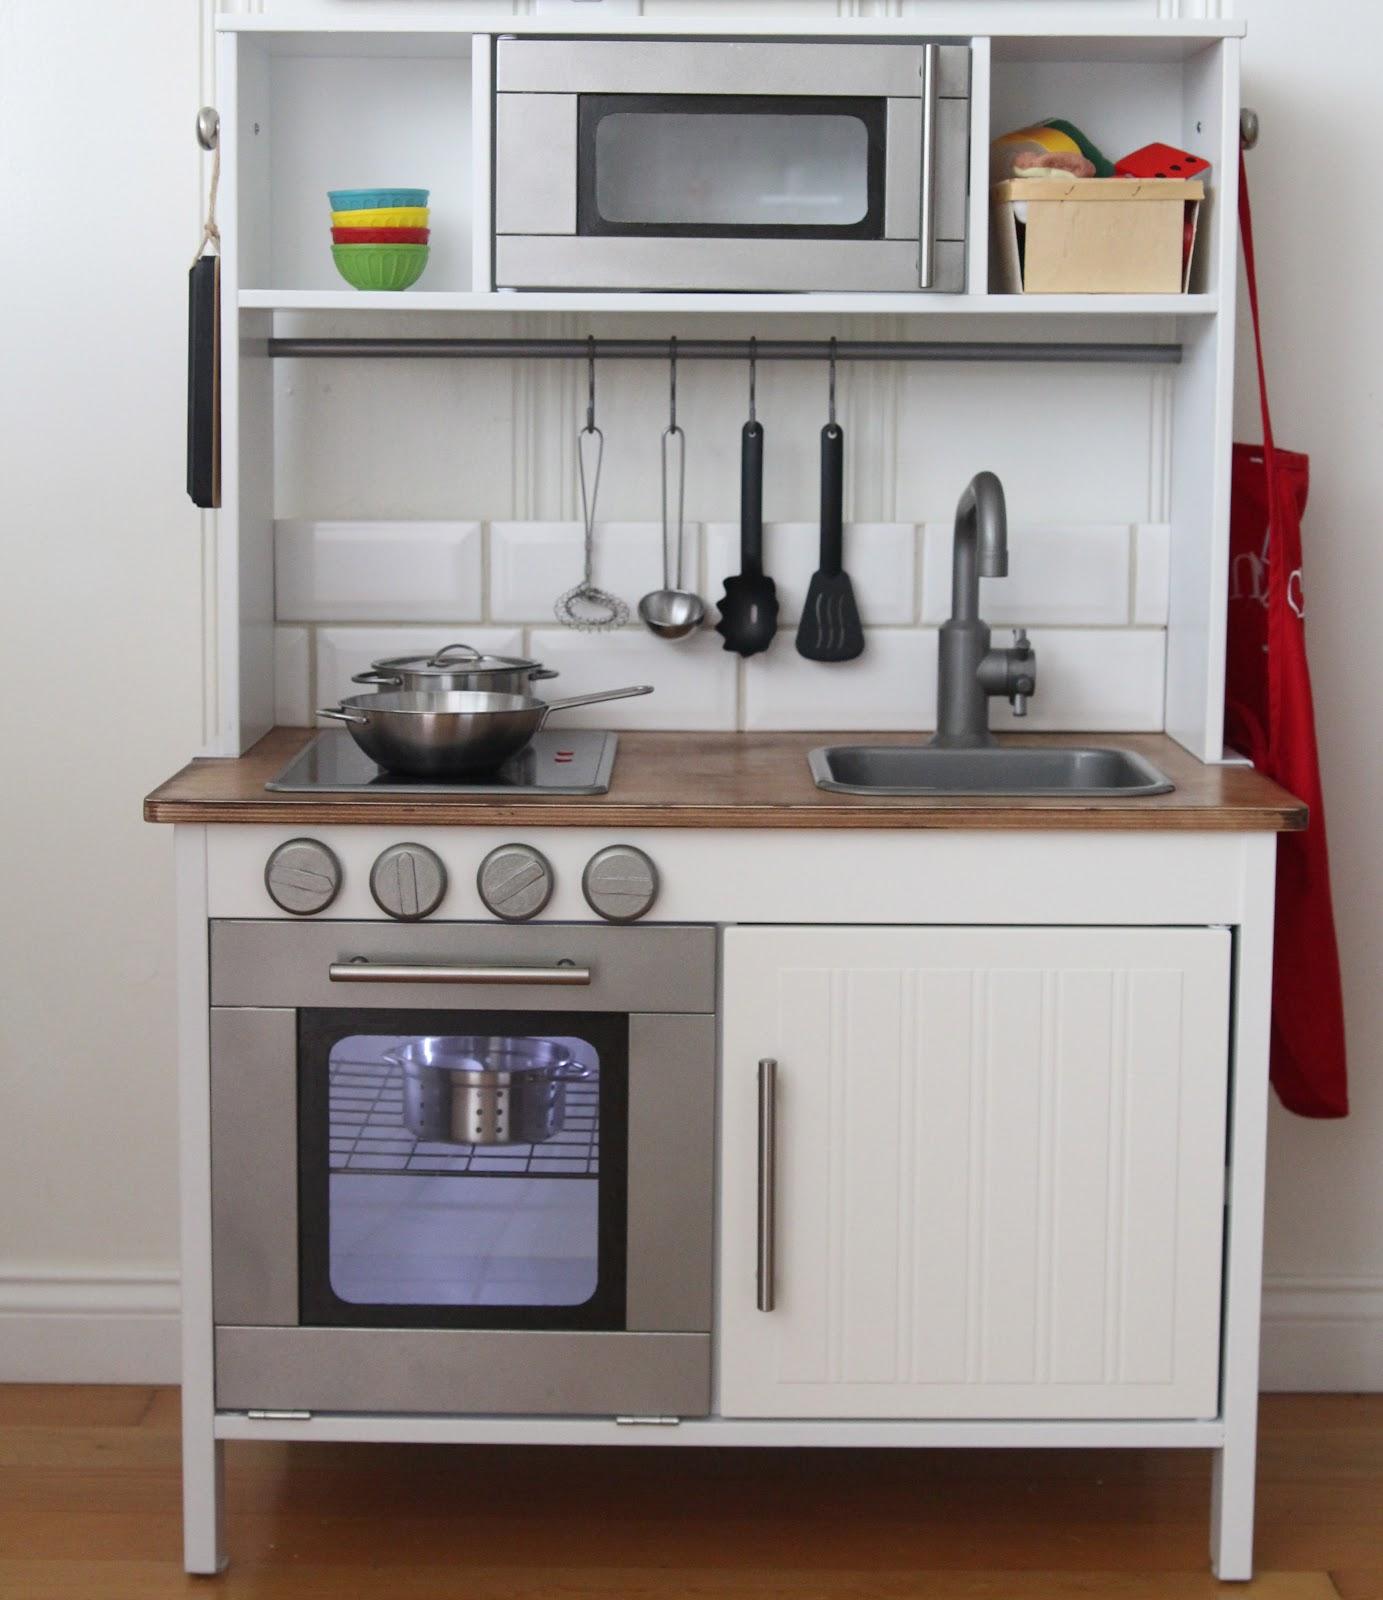 Ikea Play Kitchen Backsplash